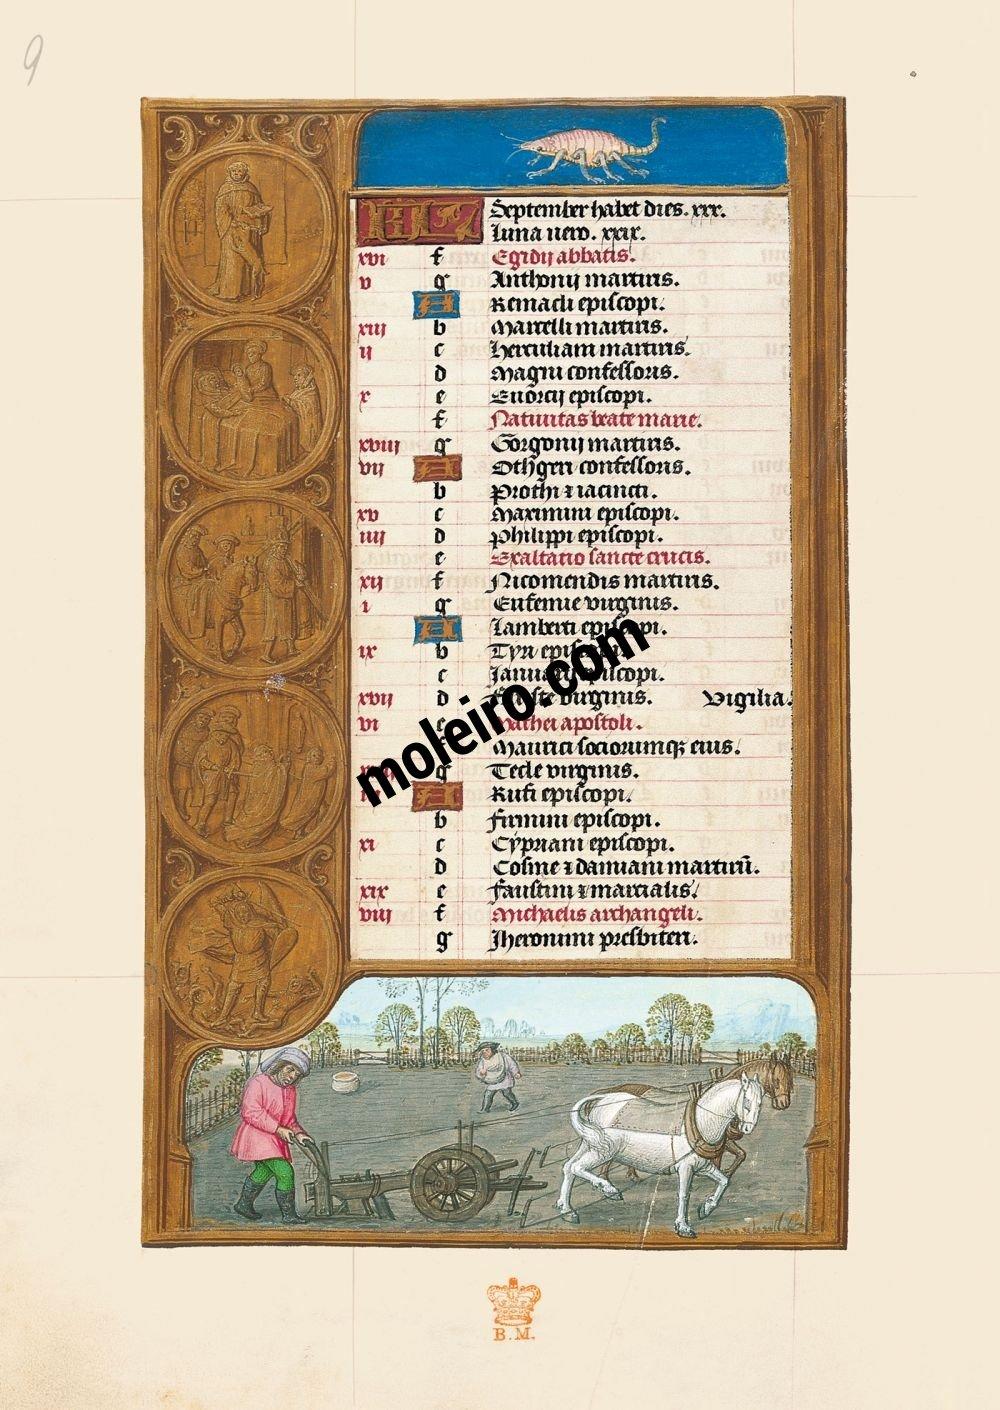 The Hours of Joanna I of Castile, Joanna the Mad (The London Rothschild Prayerbook) f. 5v, Calendar, September